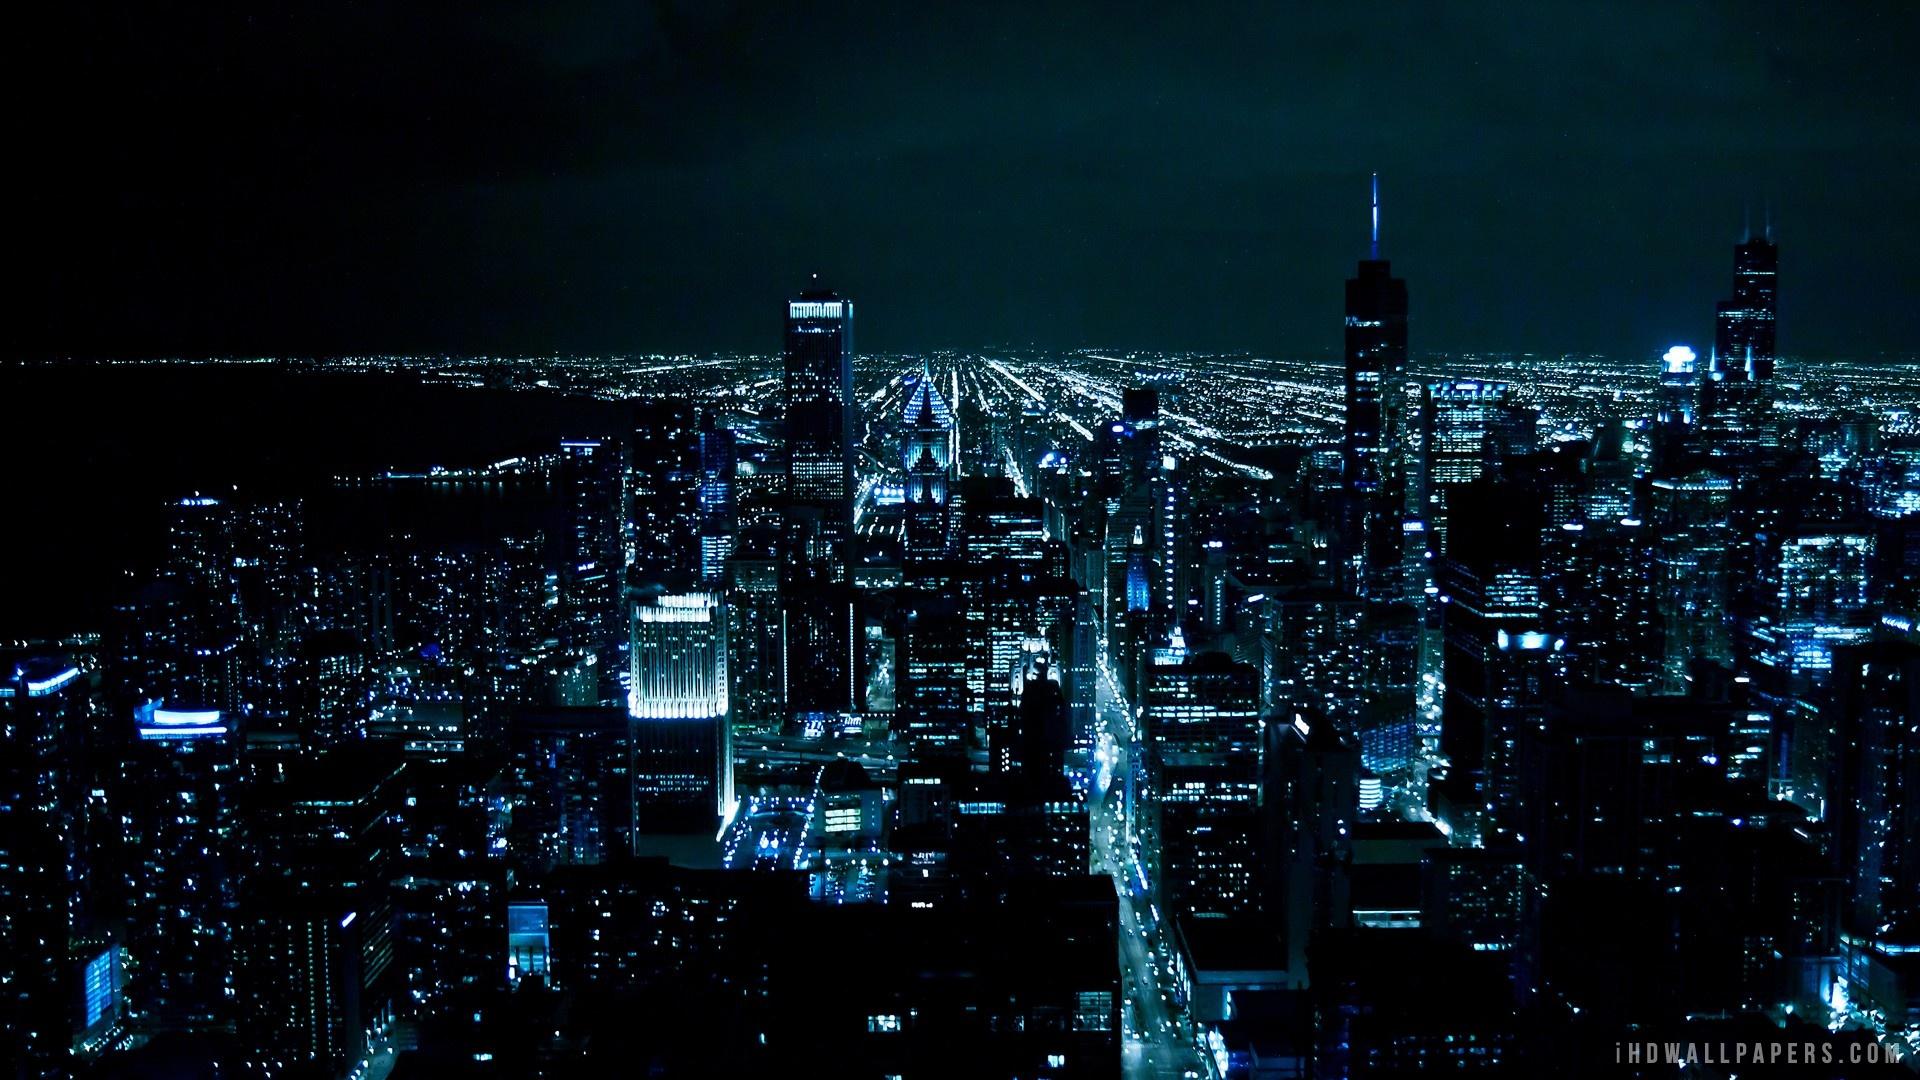 City Lights at Night Wallpapers Top Free City Lights at Night